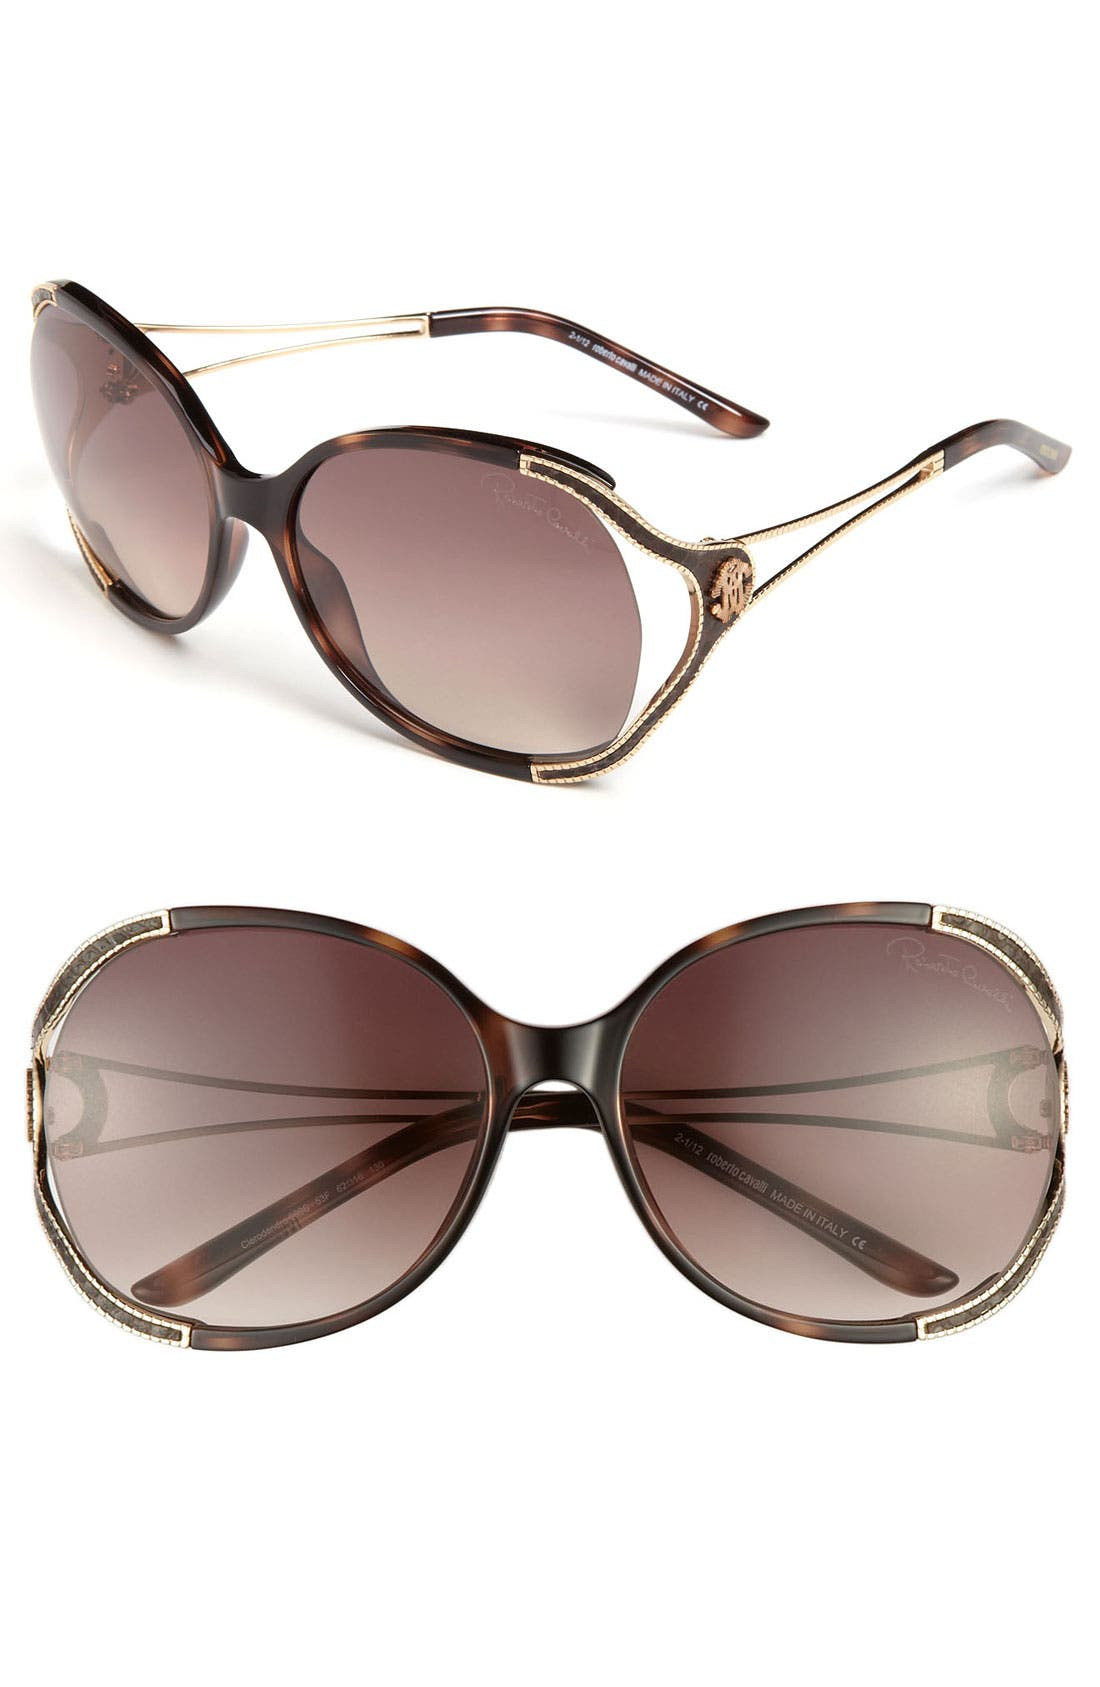 Main Image - Roberto Cavalli 62mm Oversized Sunglasses